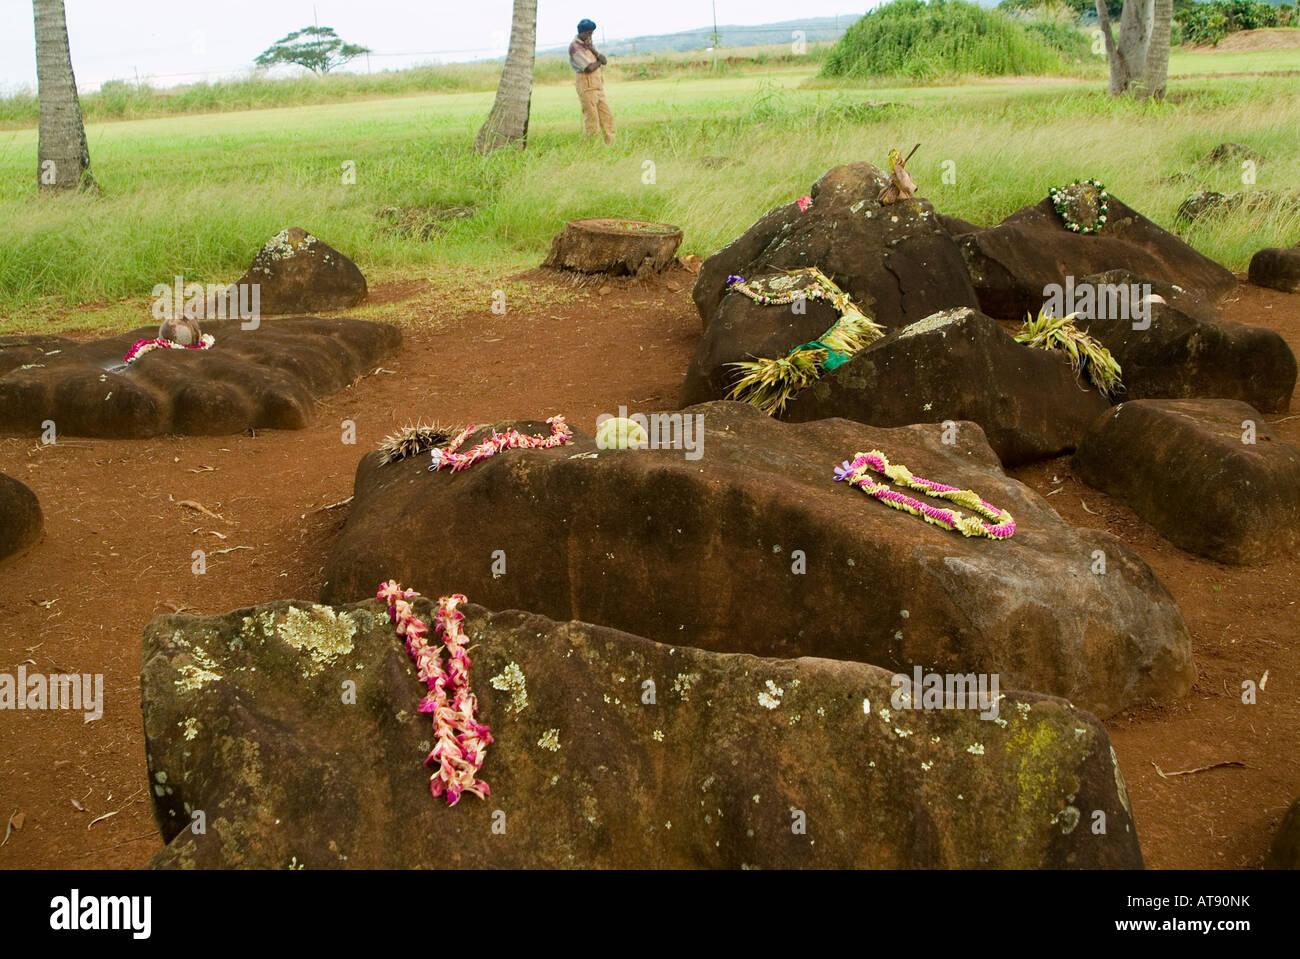 Estado Kukaniloko monumento histórico (piedras) de parto real en Wahiawa, Oahu. Close-up de piedras adornadas con lei ofrendas. Foto de stock